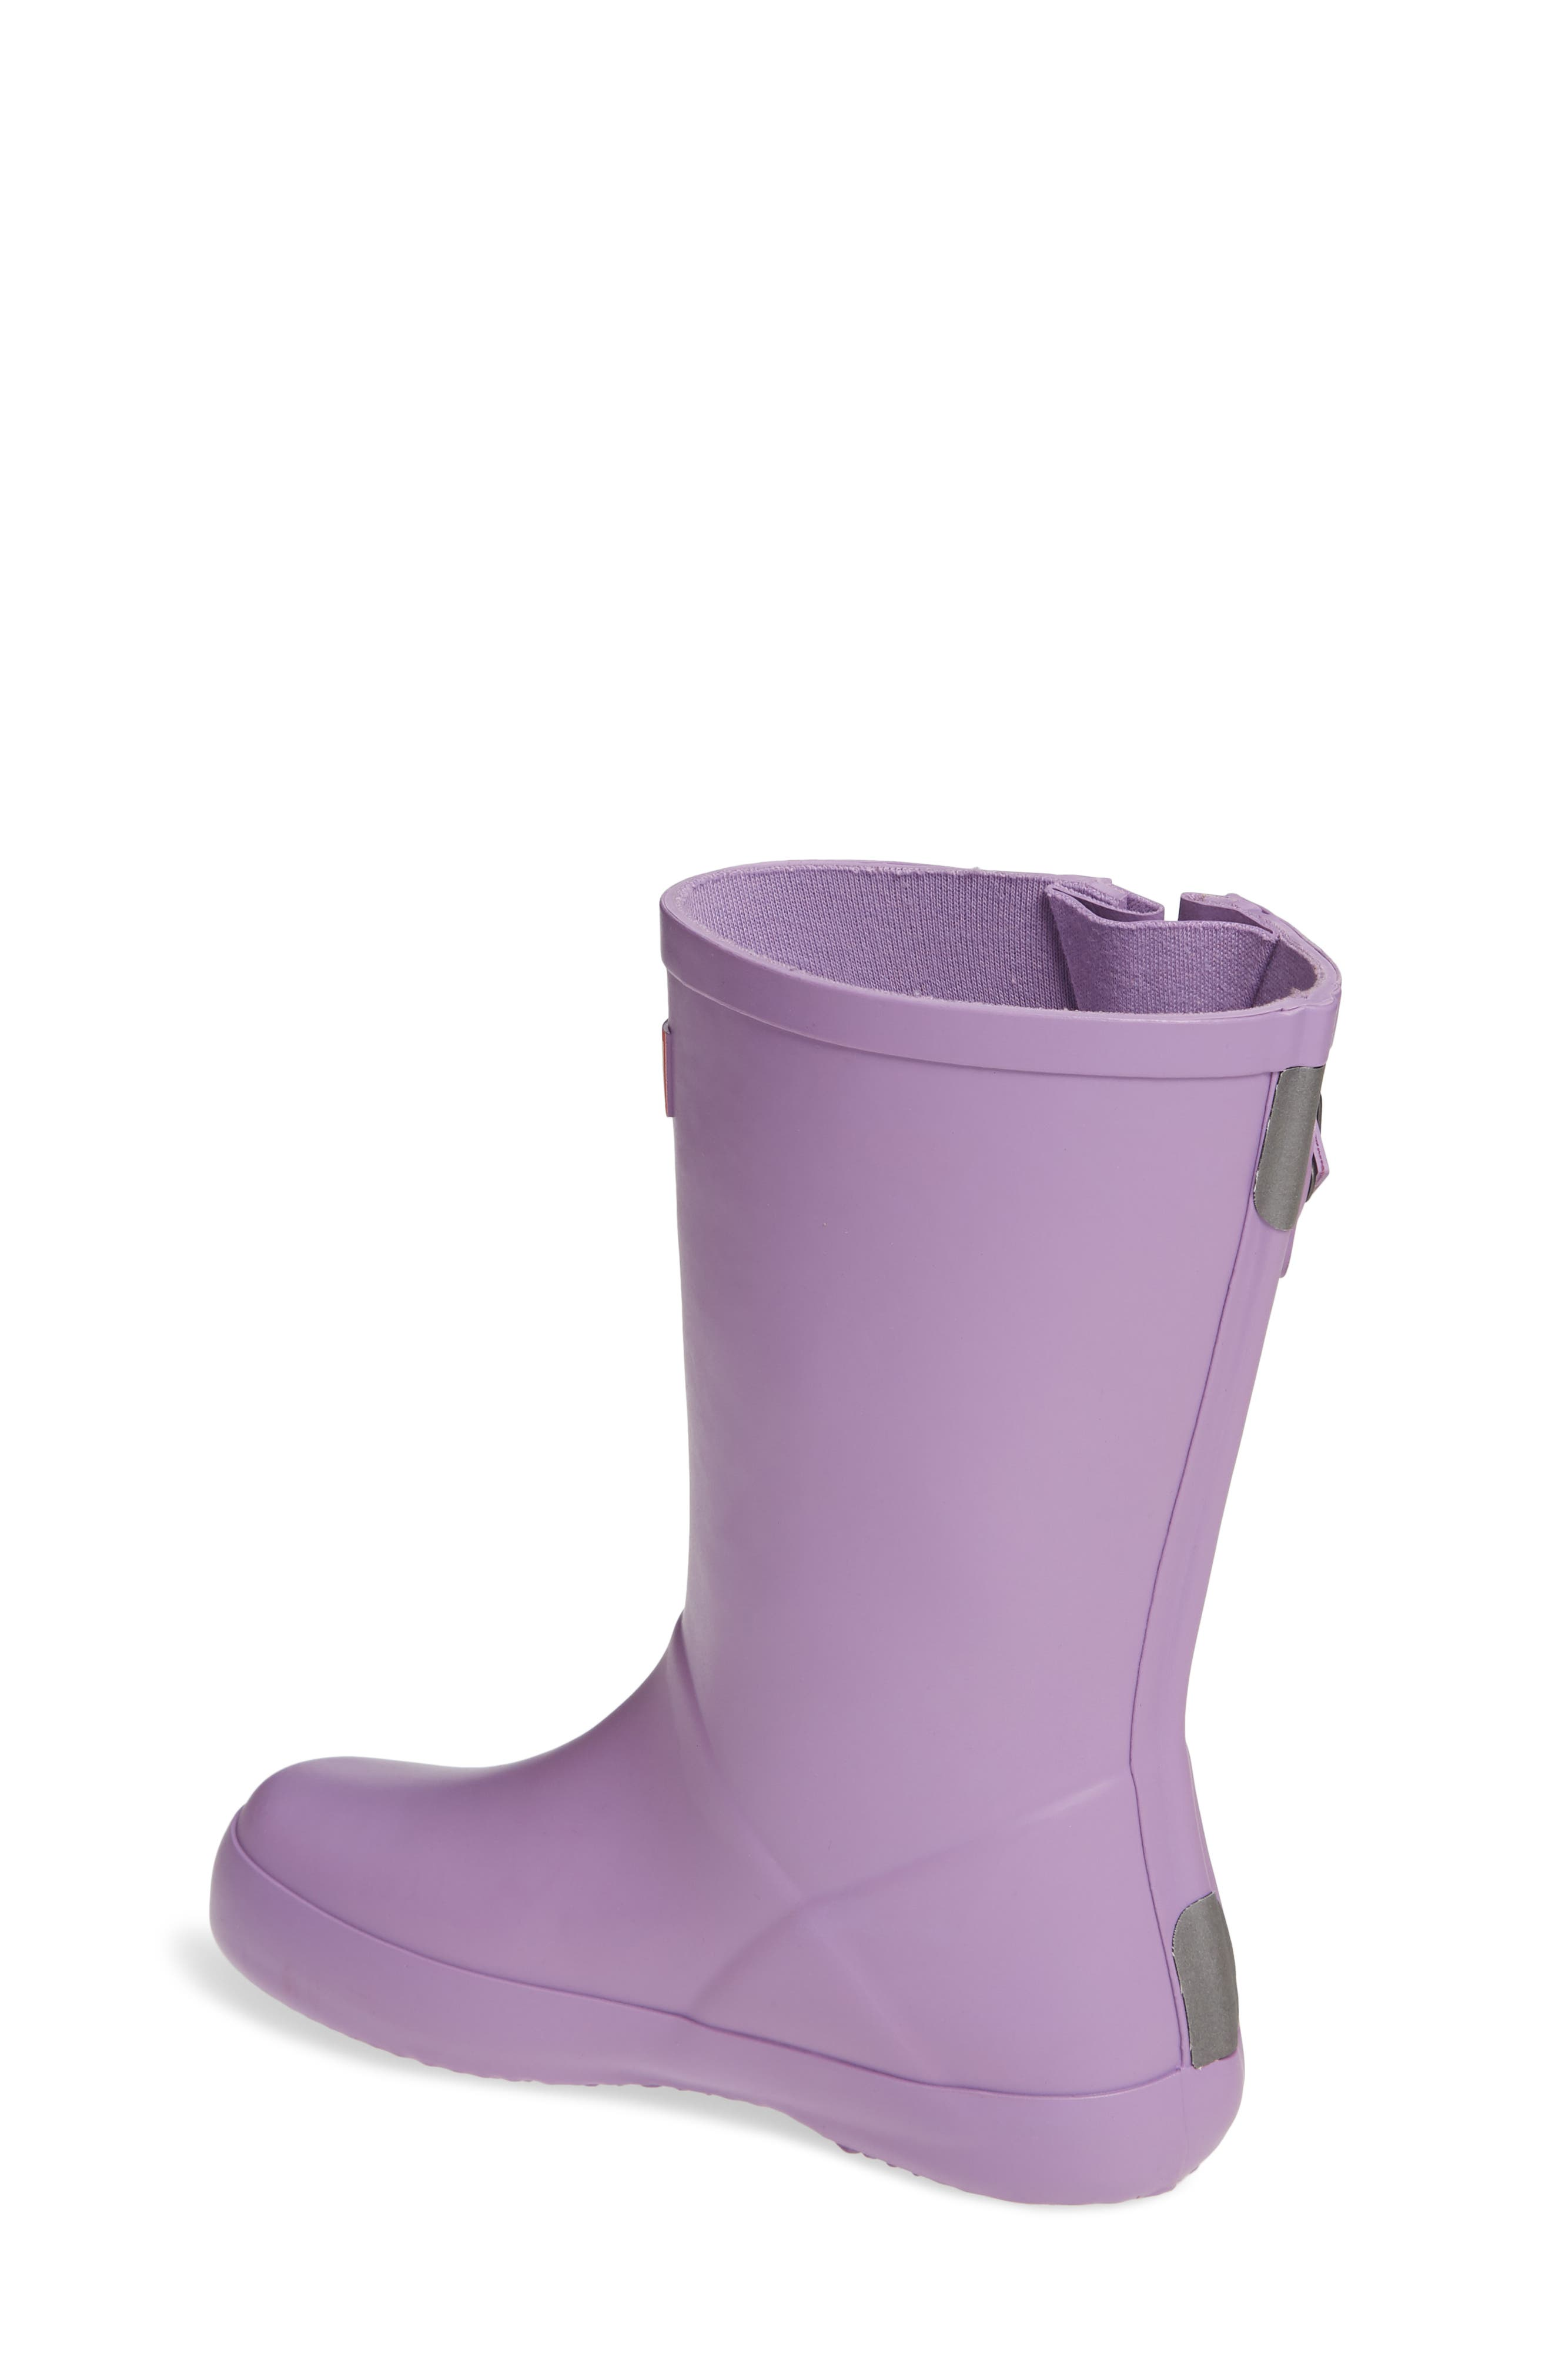 Buckle Strap Rain Boot,                             Alternate thumbnail 2, color,                             BRIGHT LAVENDER